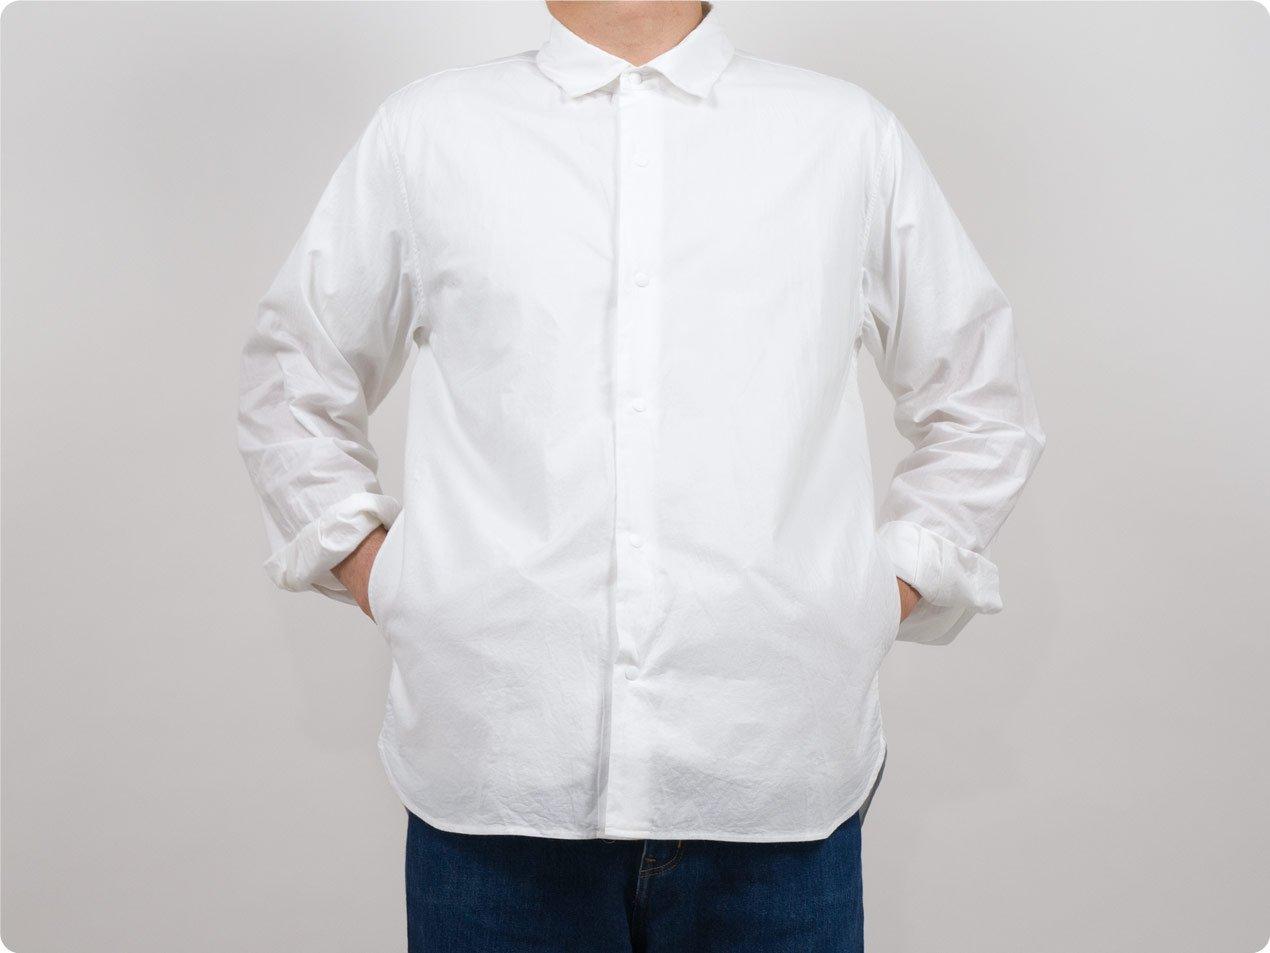 YAECA コンフォートシャツ リラックス ロング WHITE 〔メンズ〕